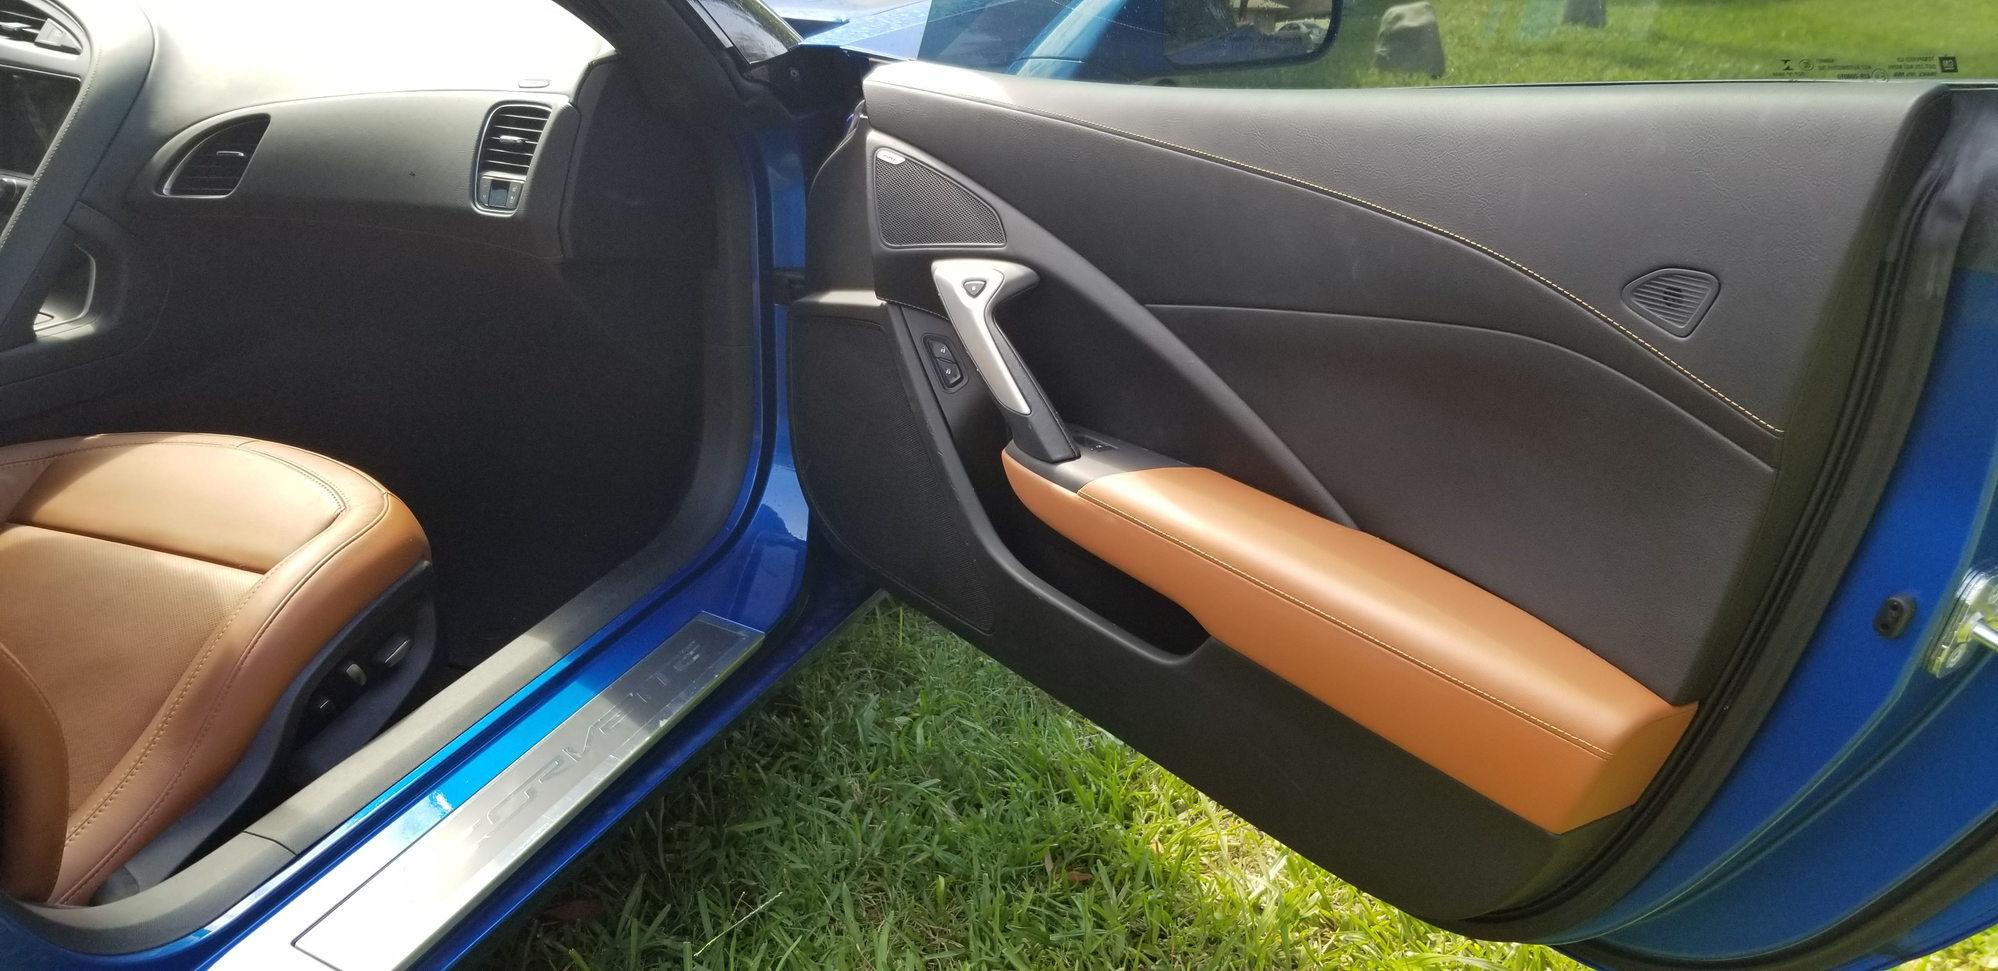 Fs For Sale 2016 Corvette 2lt Laguna Blue Kalahari M7